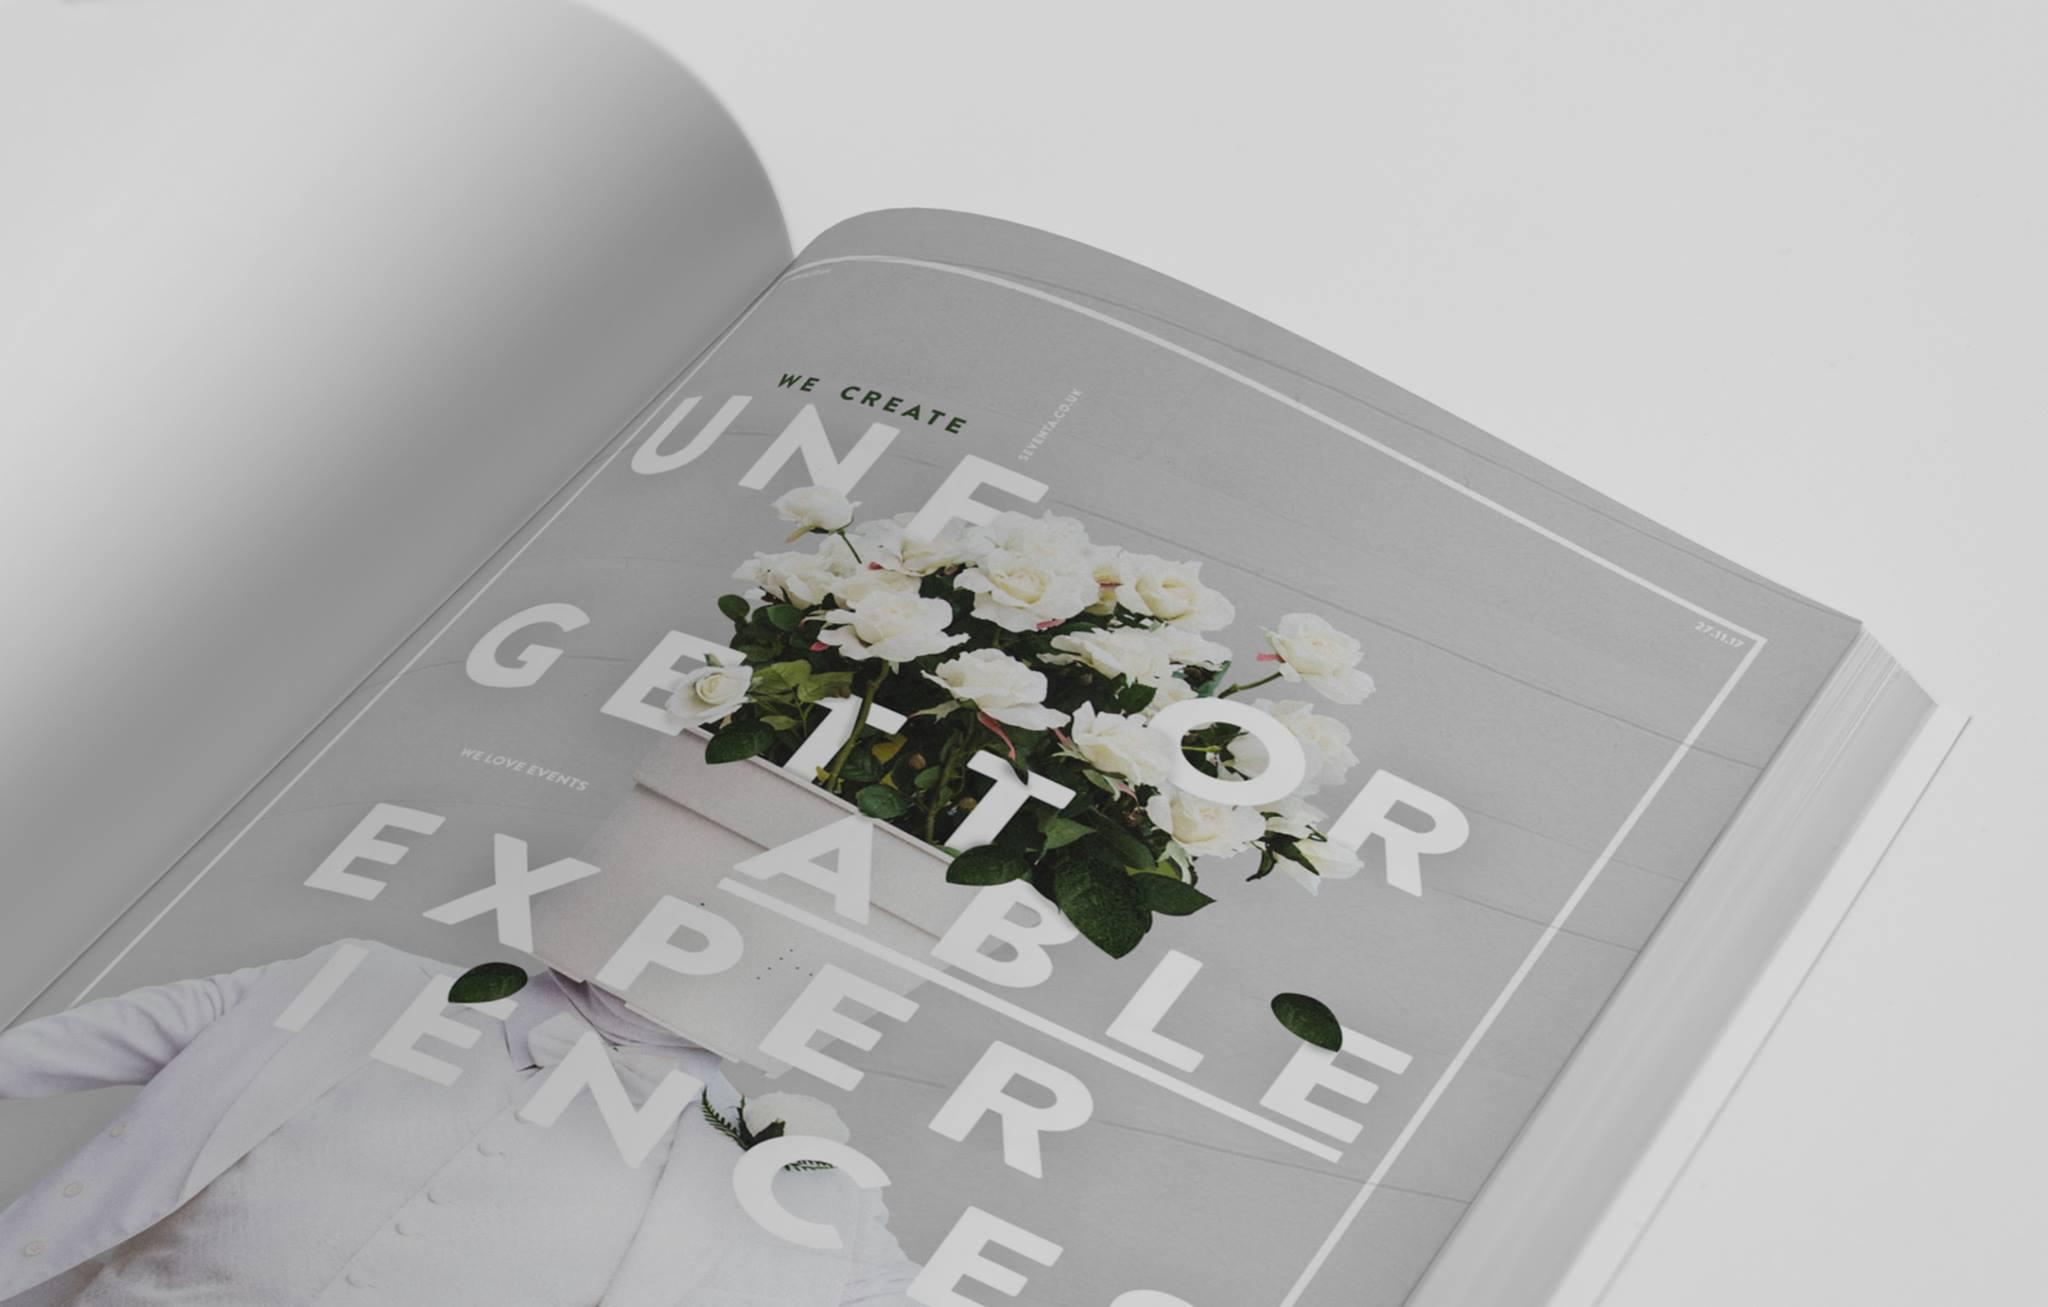 Seventa brochure